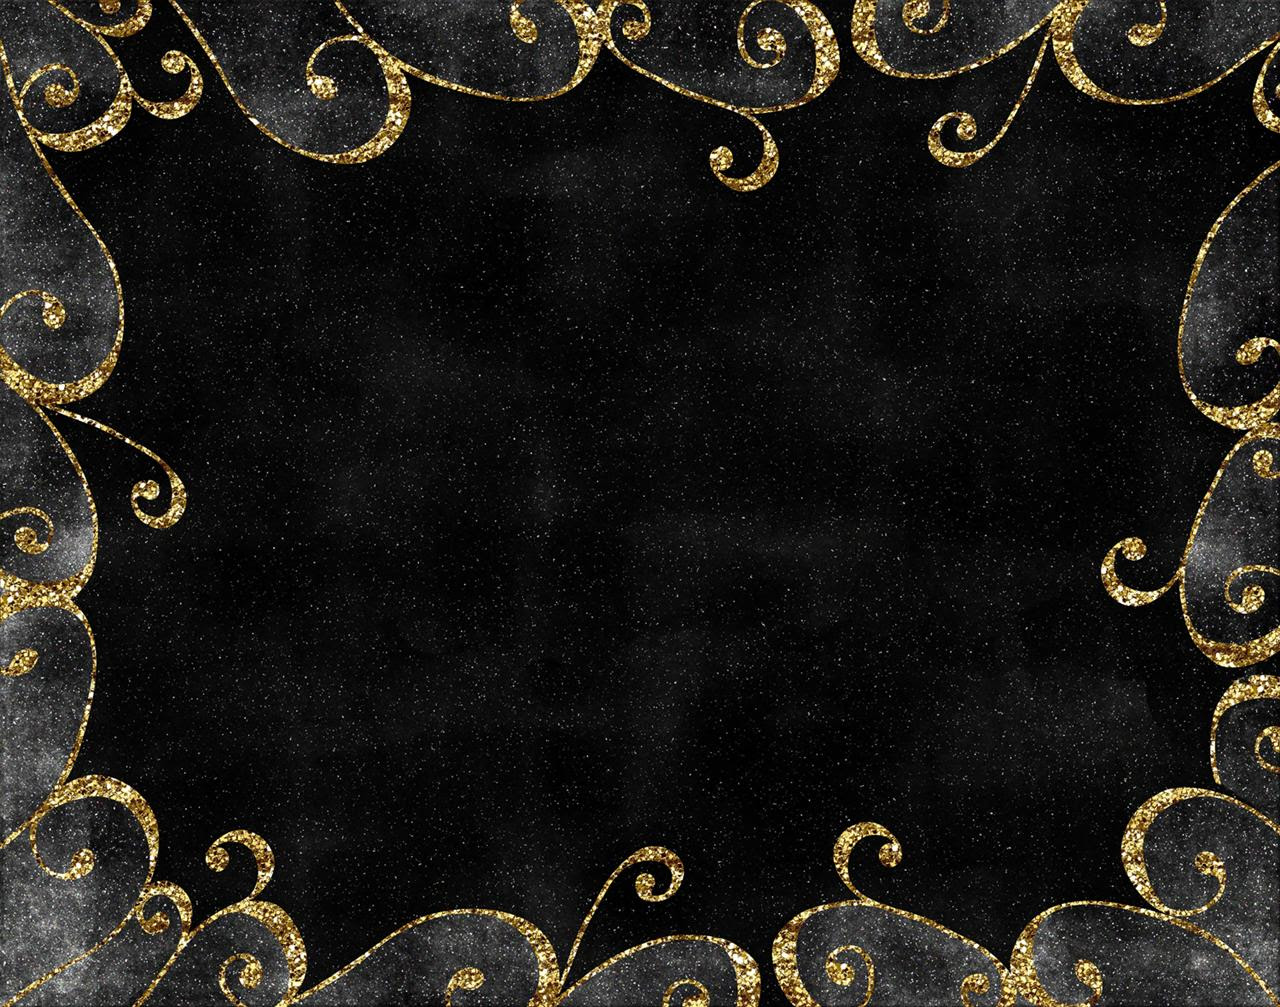 Black And Gold Background 21 Cool Wallpaper  Hdblackwallpaper.com